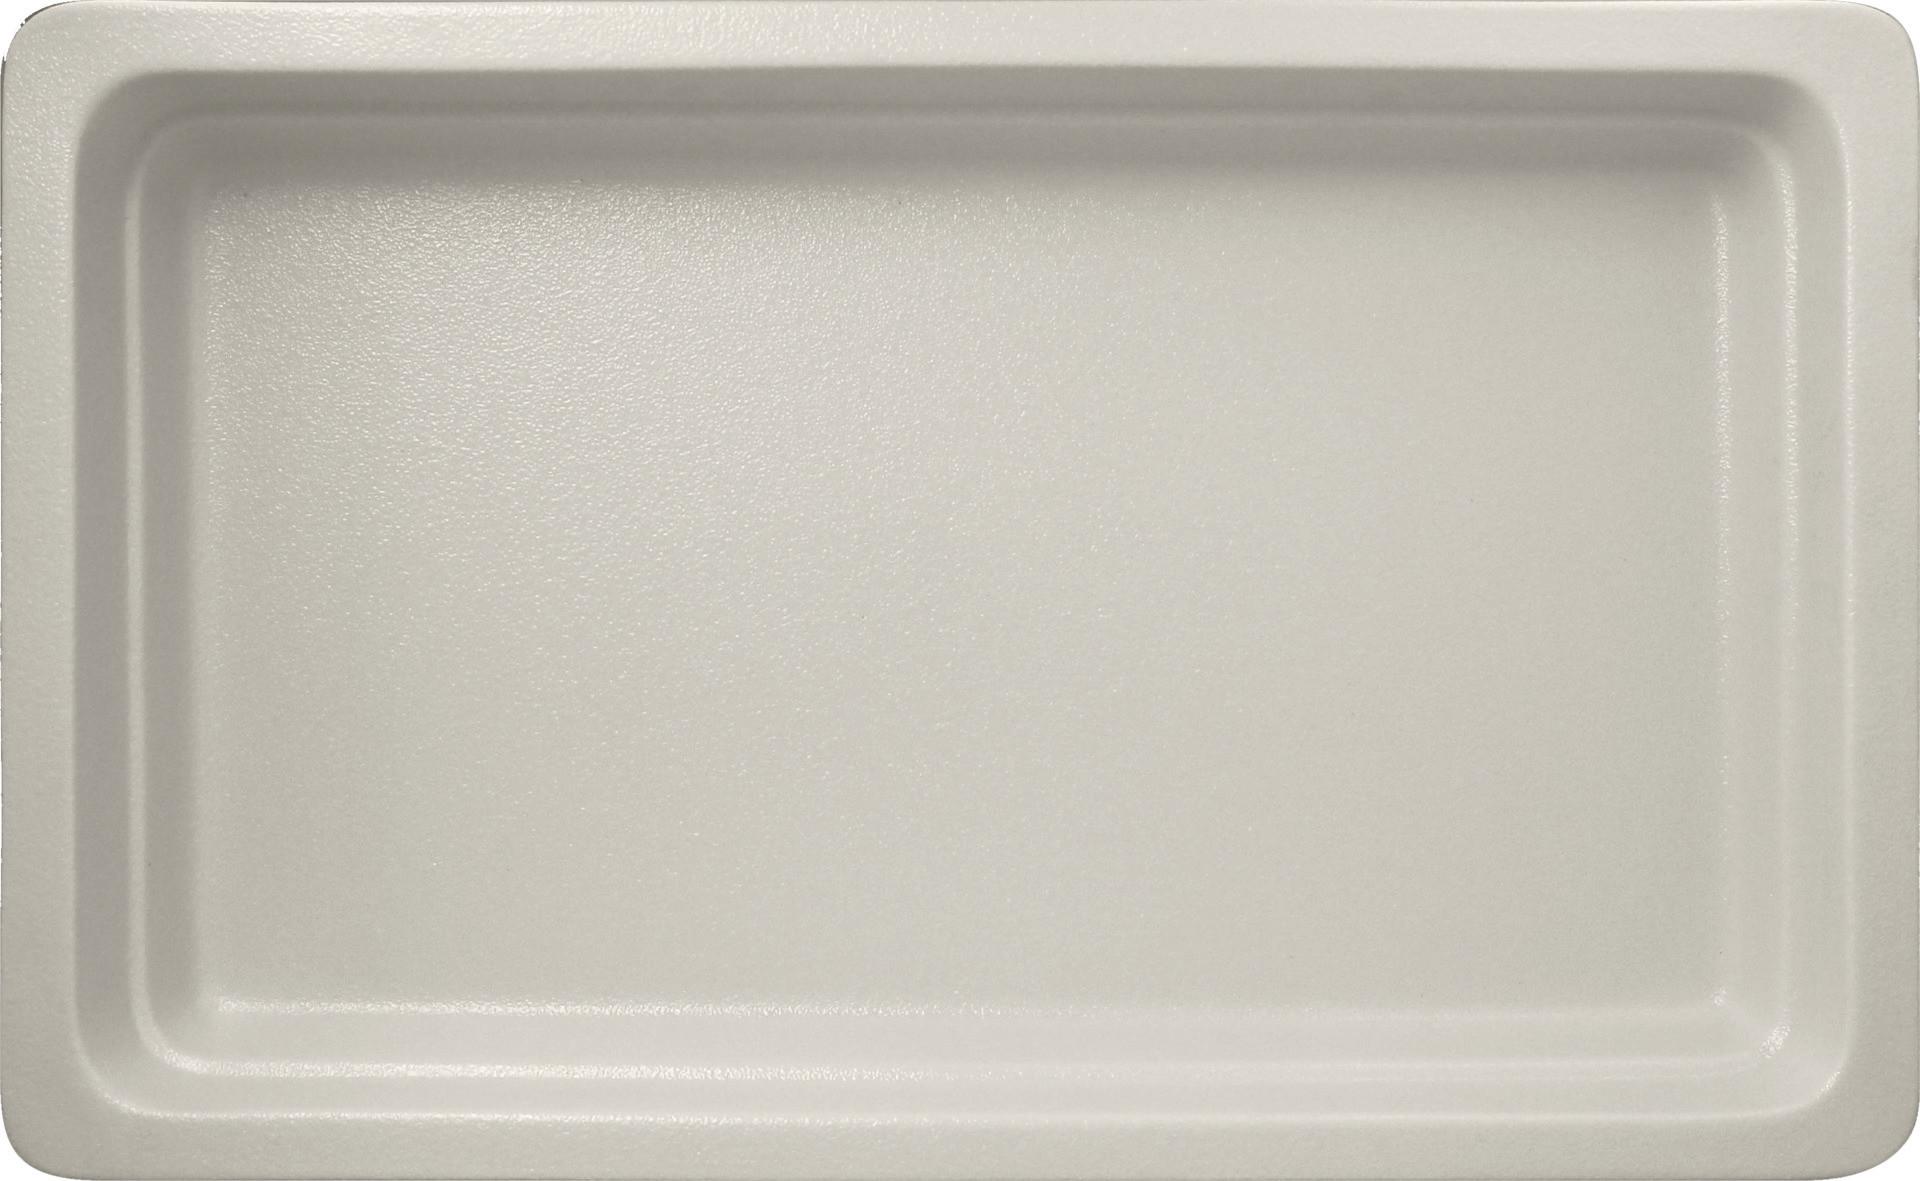 Neofusion, GN-Schale GN 1/1 530 x 325 mm / 7,30 l sand